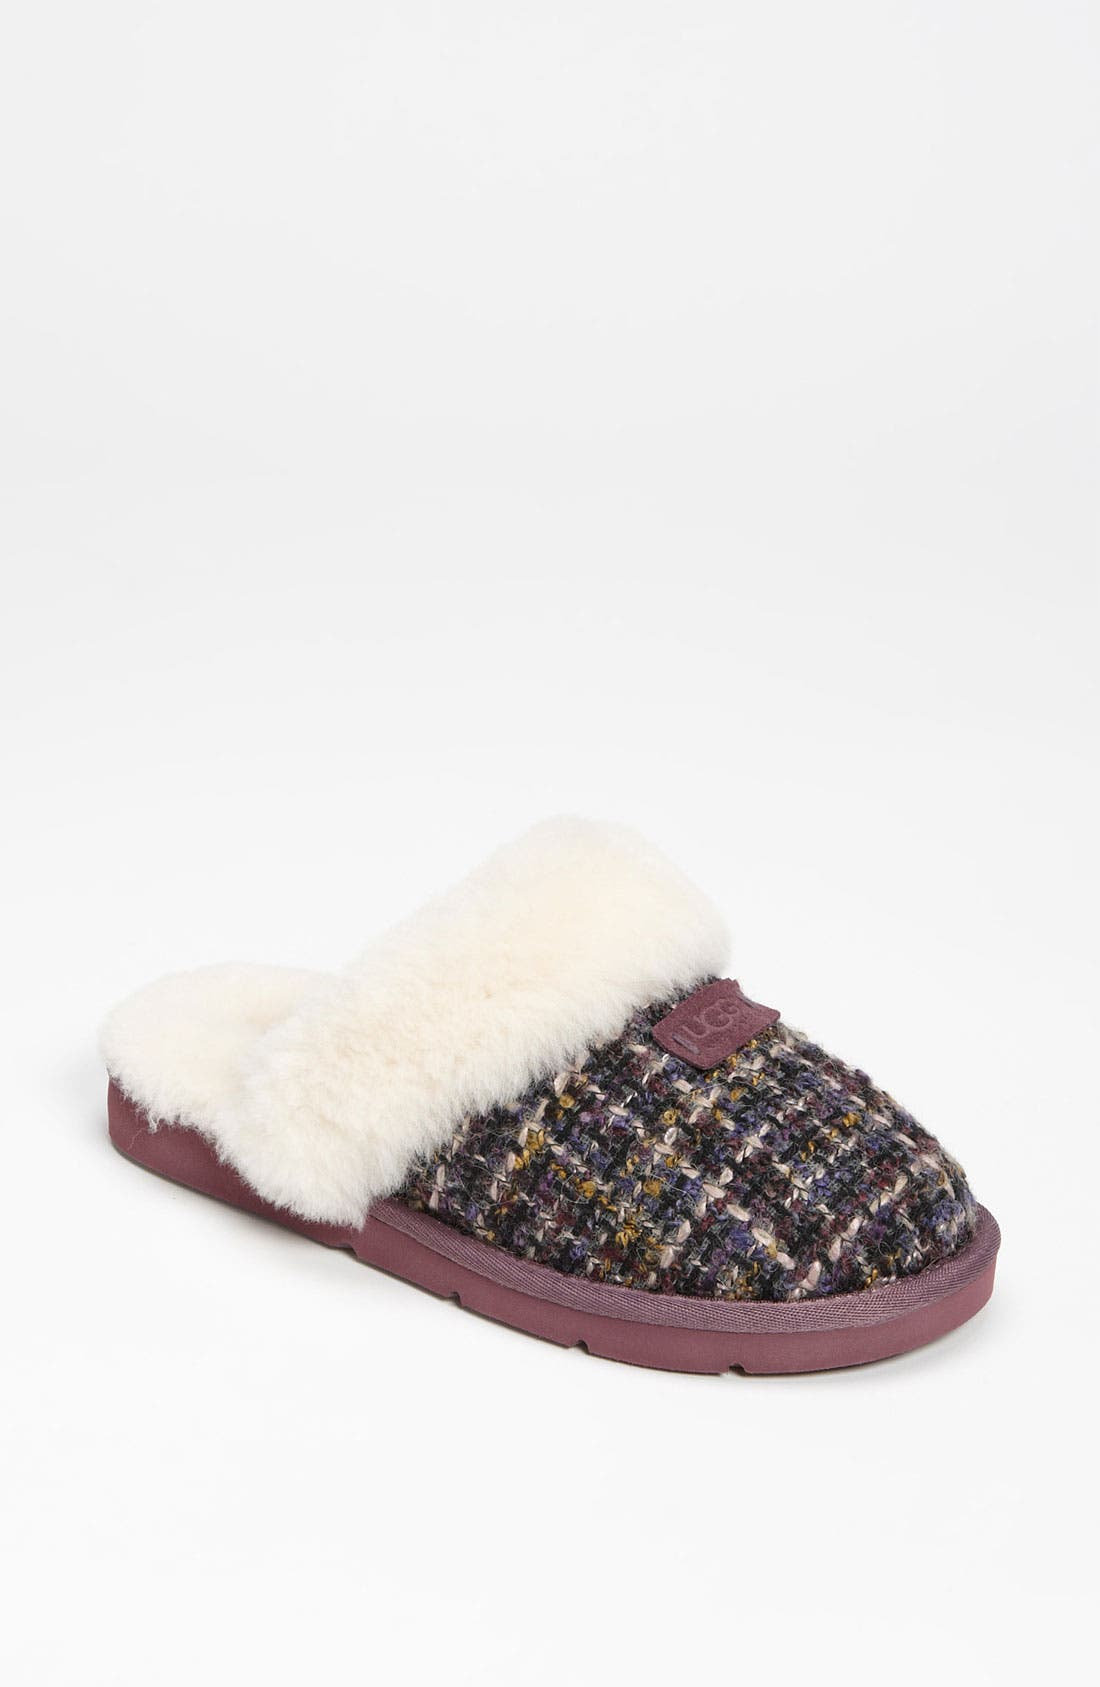 Main Image - UGG® Australia 'Cozy Tweed' Slipper (Women)